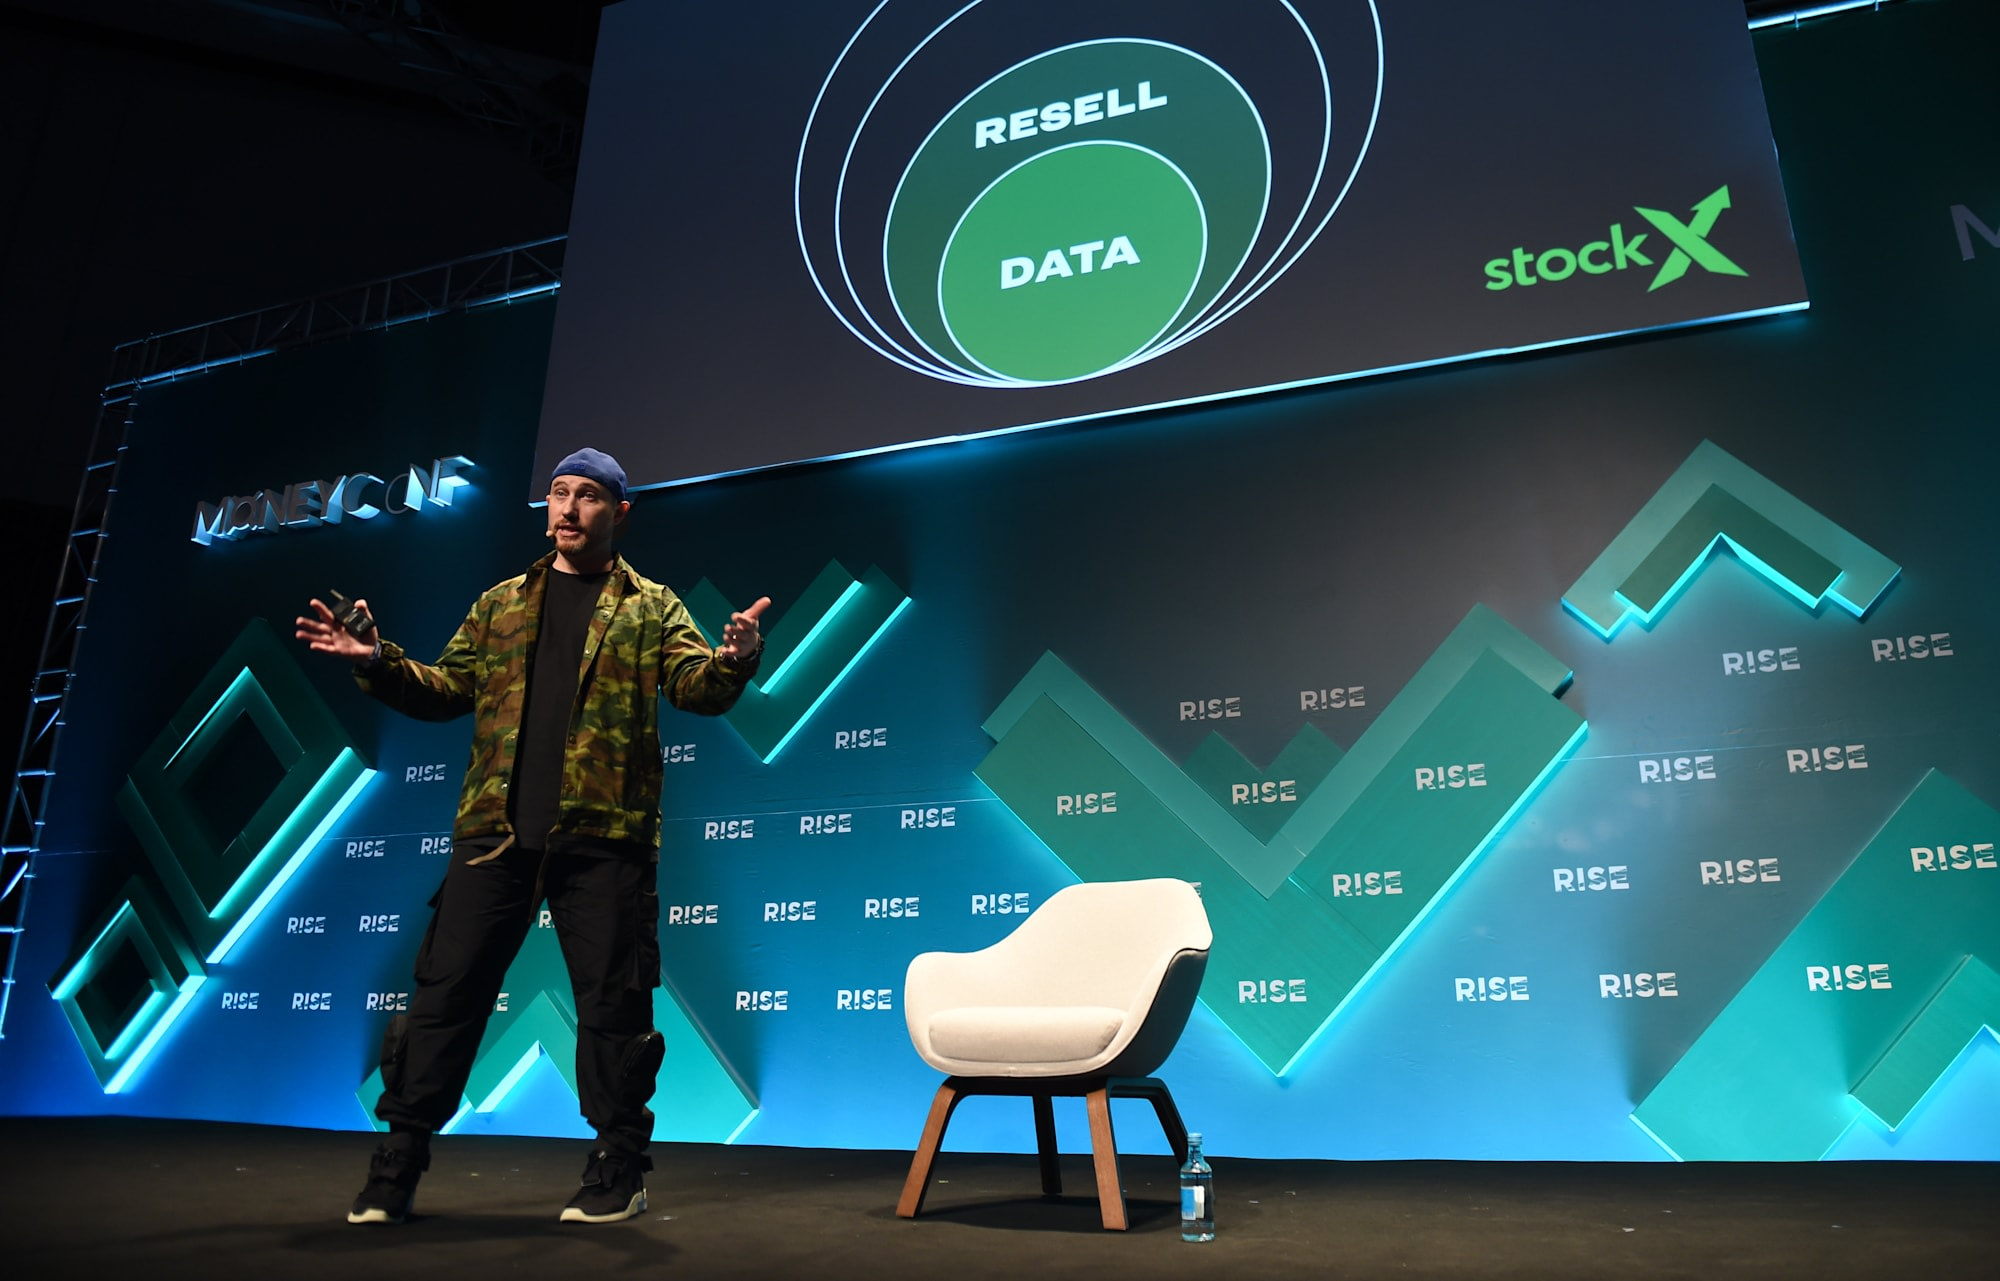 Online sneaker reseller StockX faces lawsuit over data breach